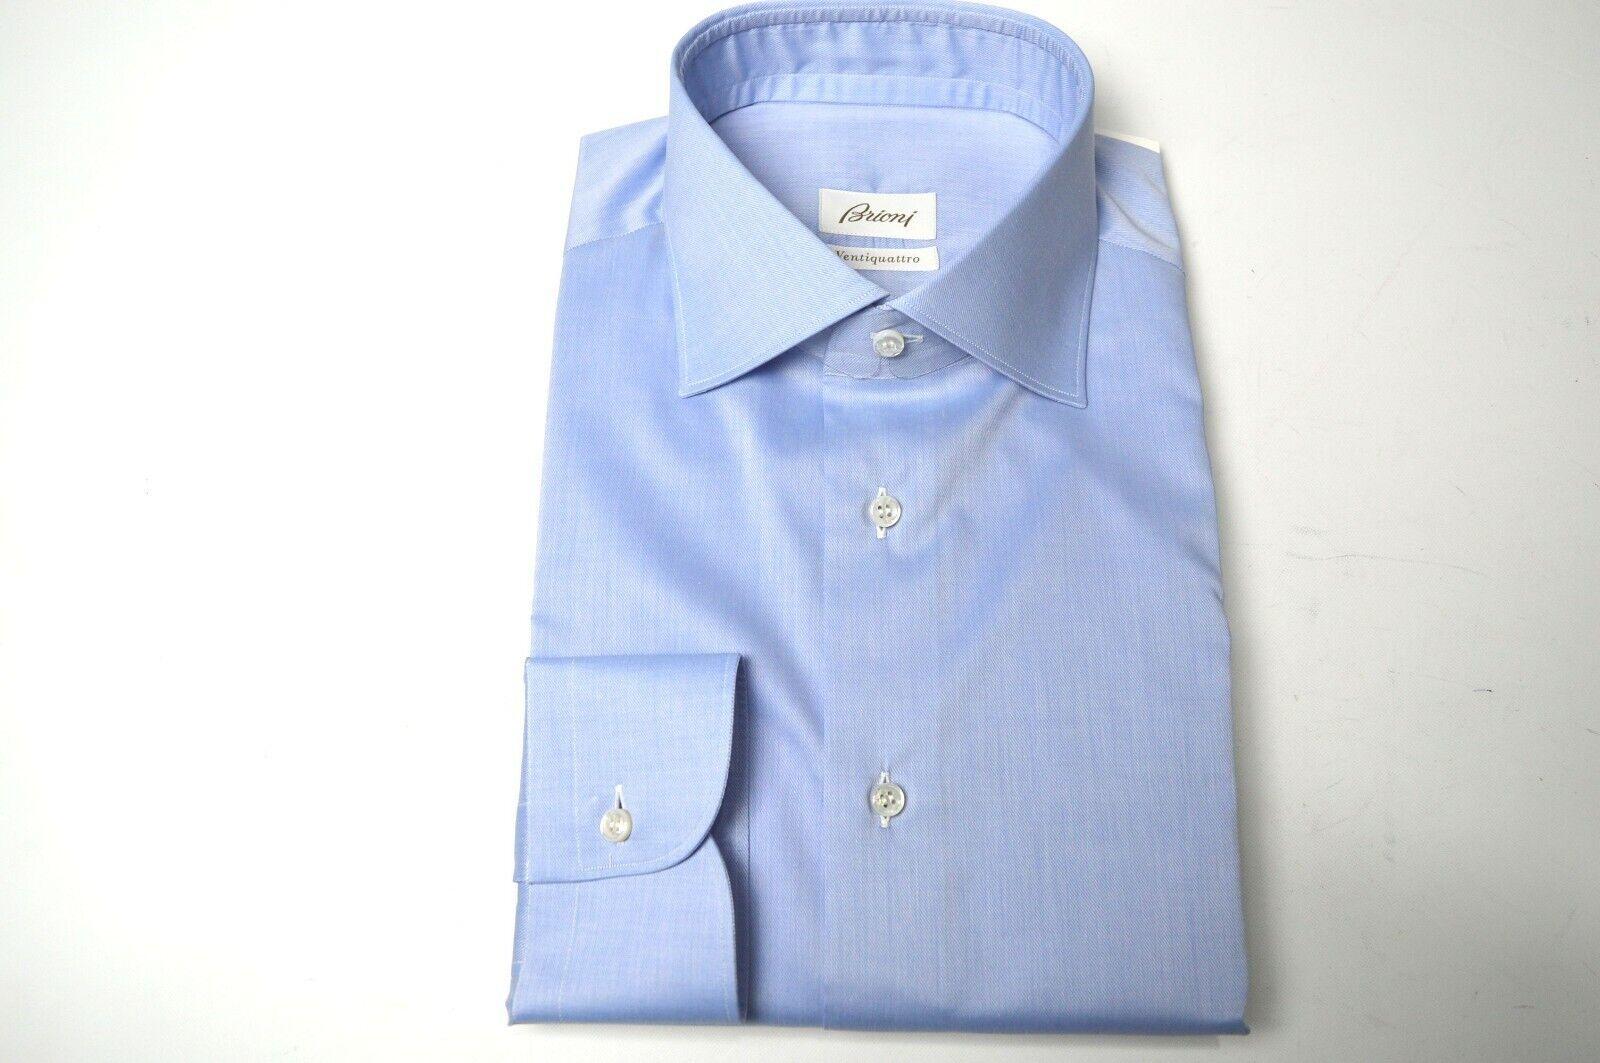 NEW BRIONI Dress Elegant hemd 100% baumwolle Größe Neck 17 Us 43 Eu Blau (SE92)